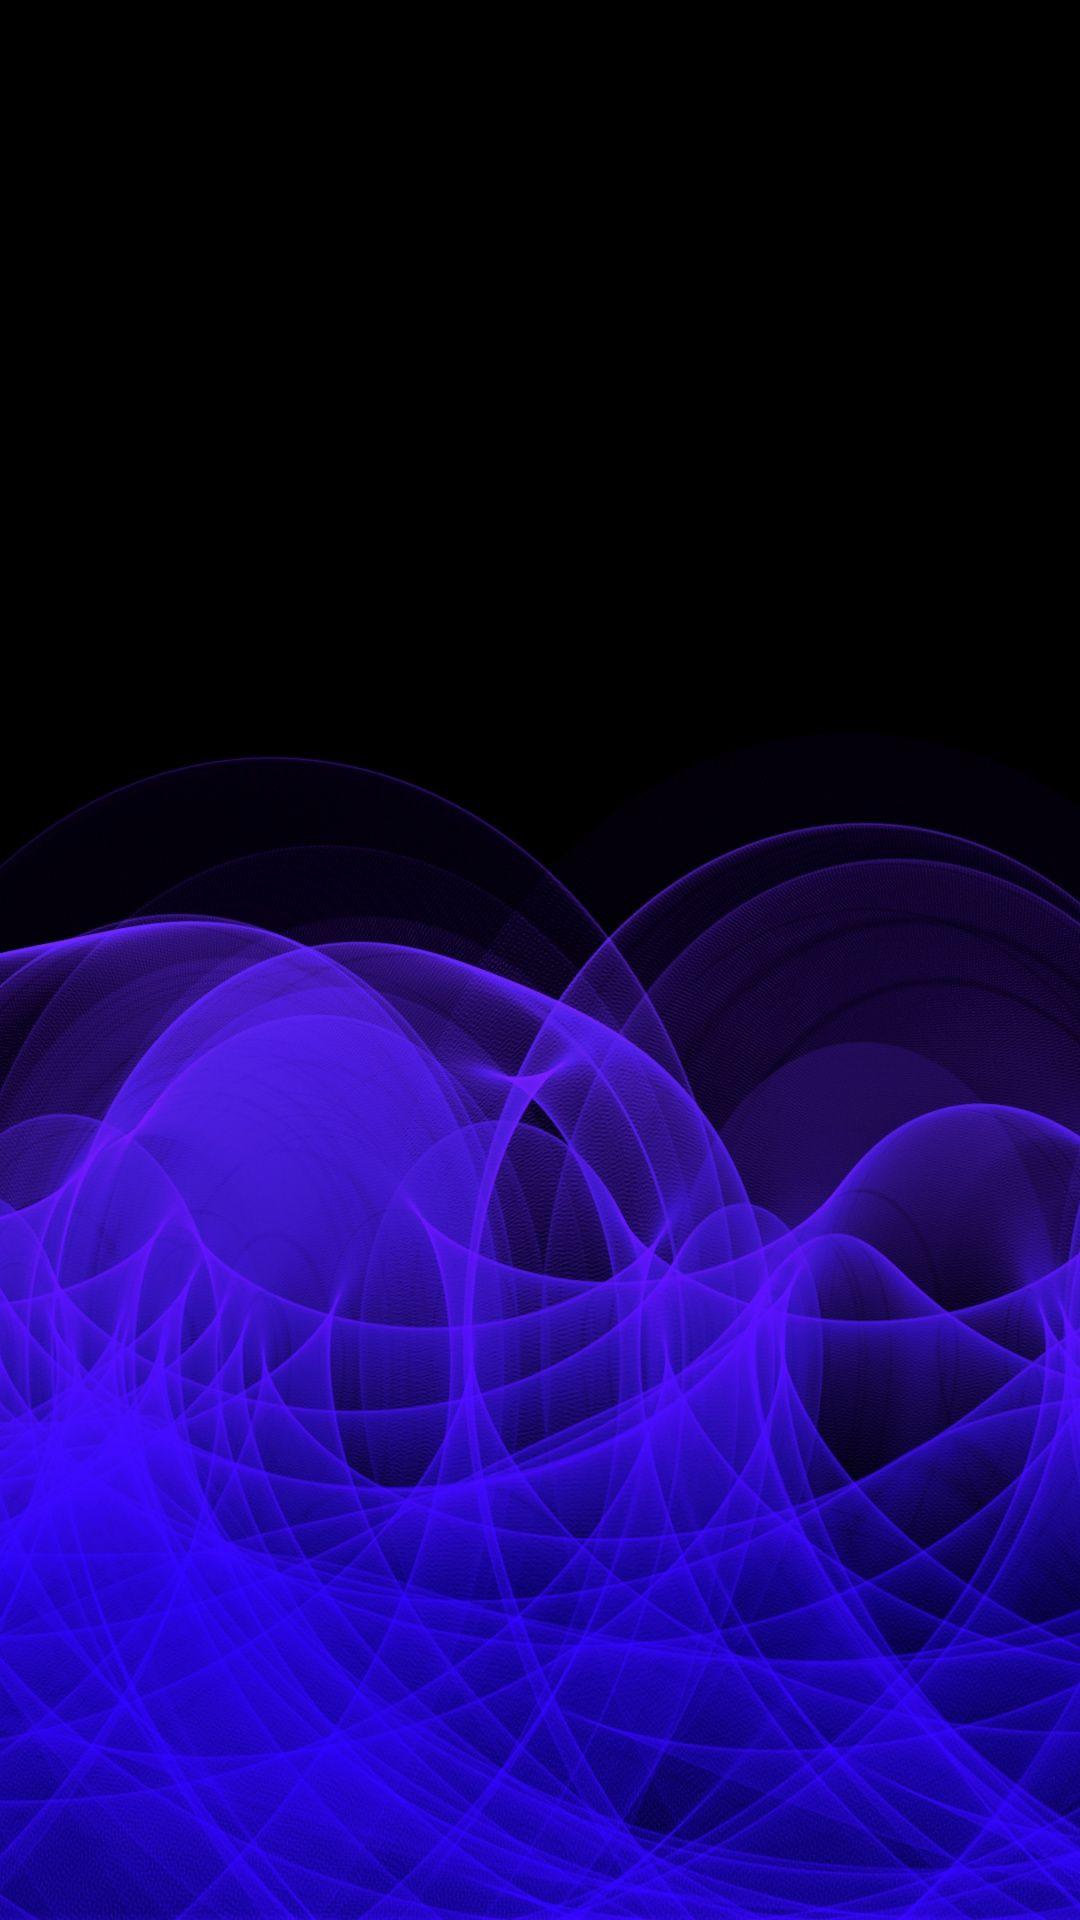 Clots Curls Blue Lines Abstraction Wallpaper Abstract Hd Wallpaper Backgrounds Phone Wallpapers